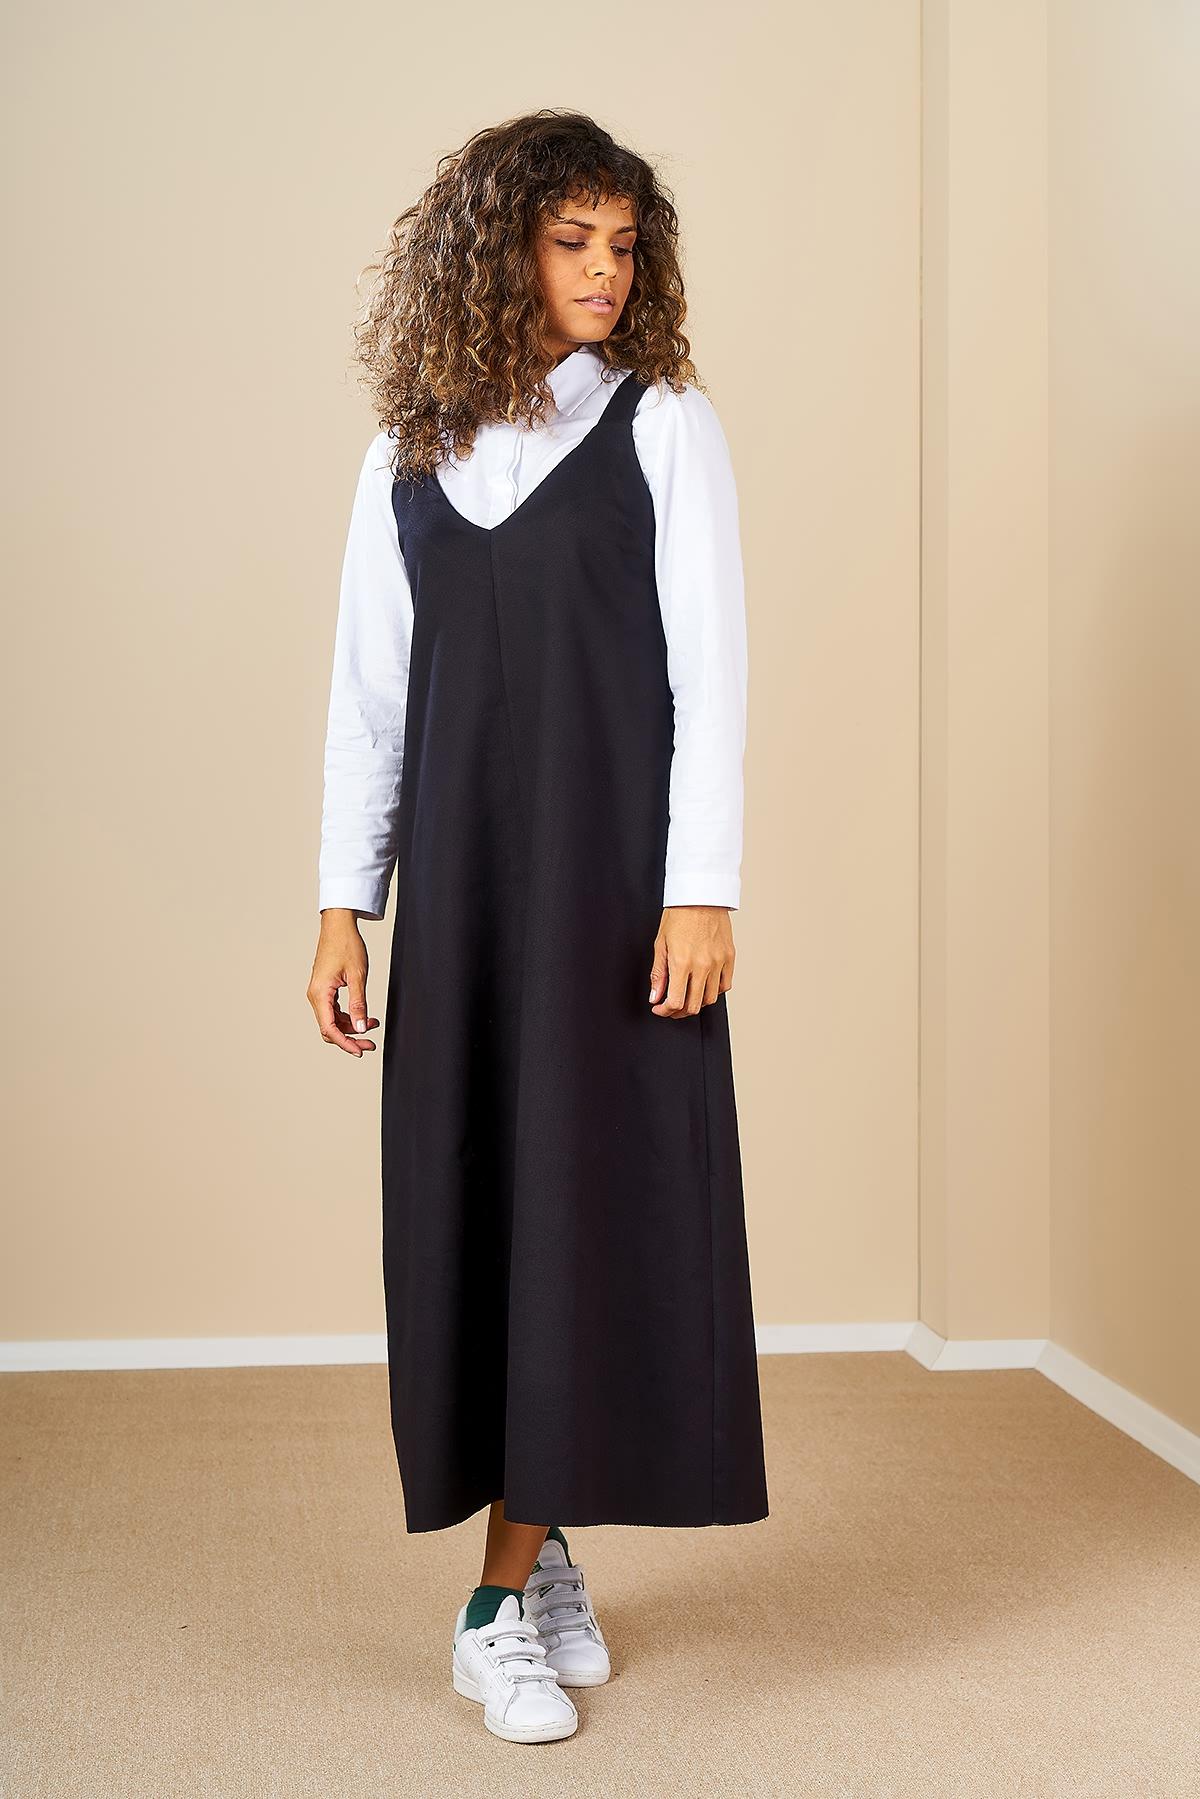 Mevra - Aybükco Jile Elbise Siyah